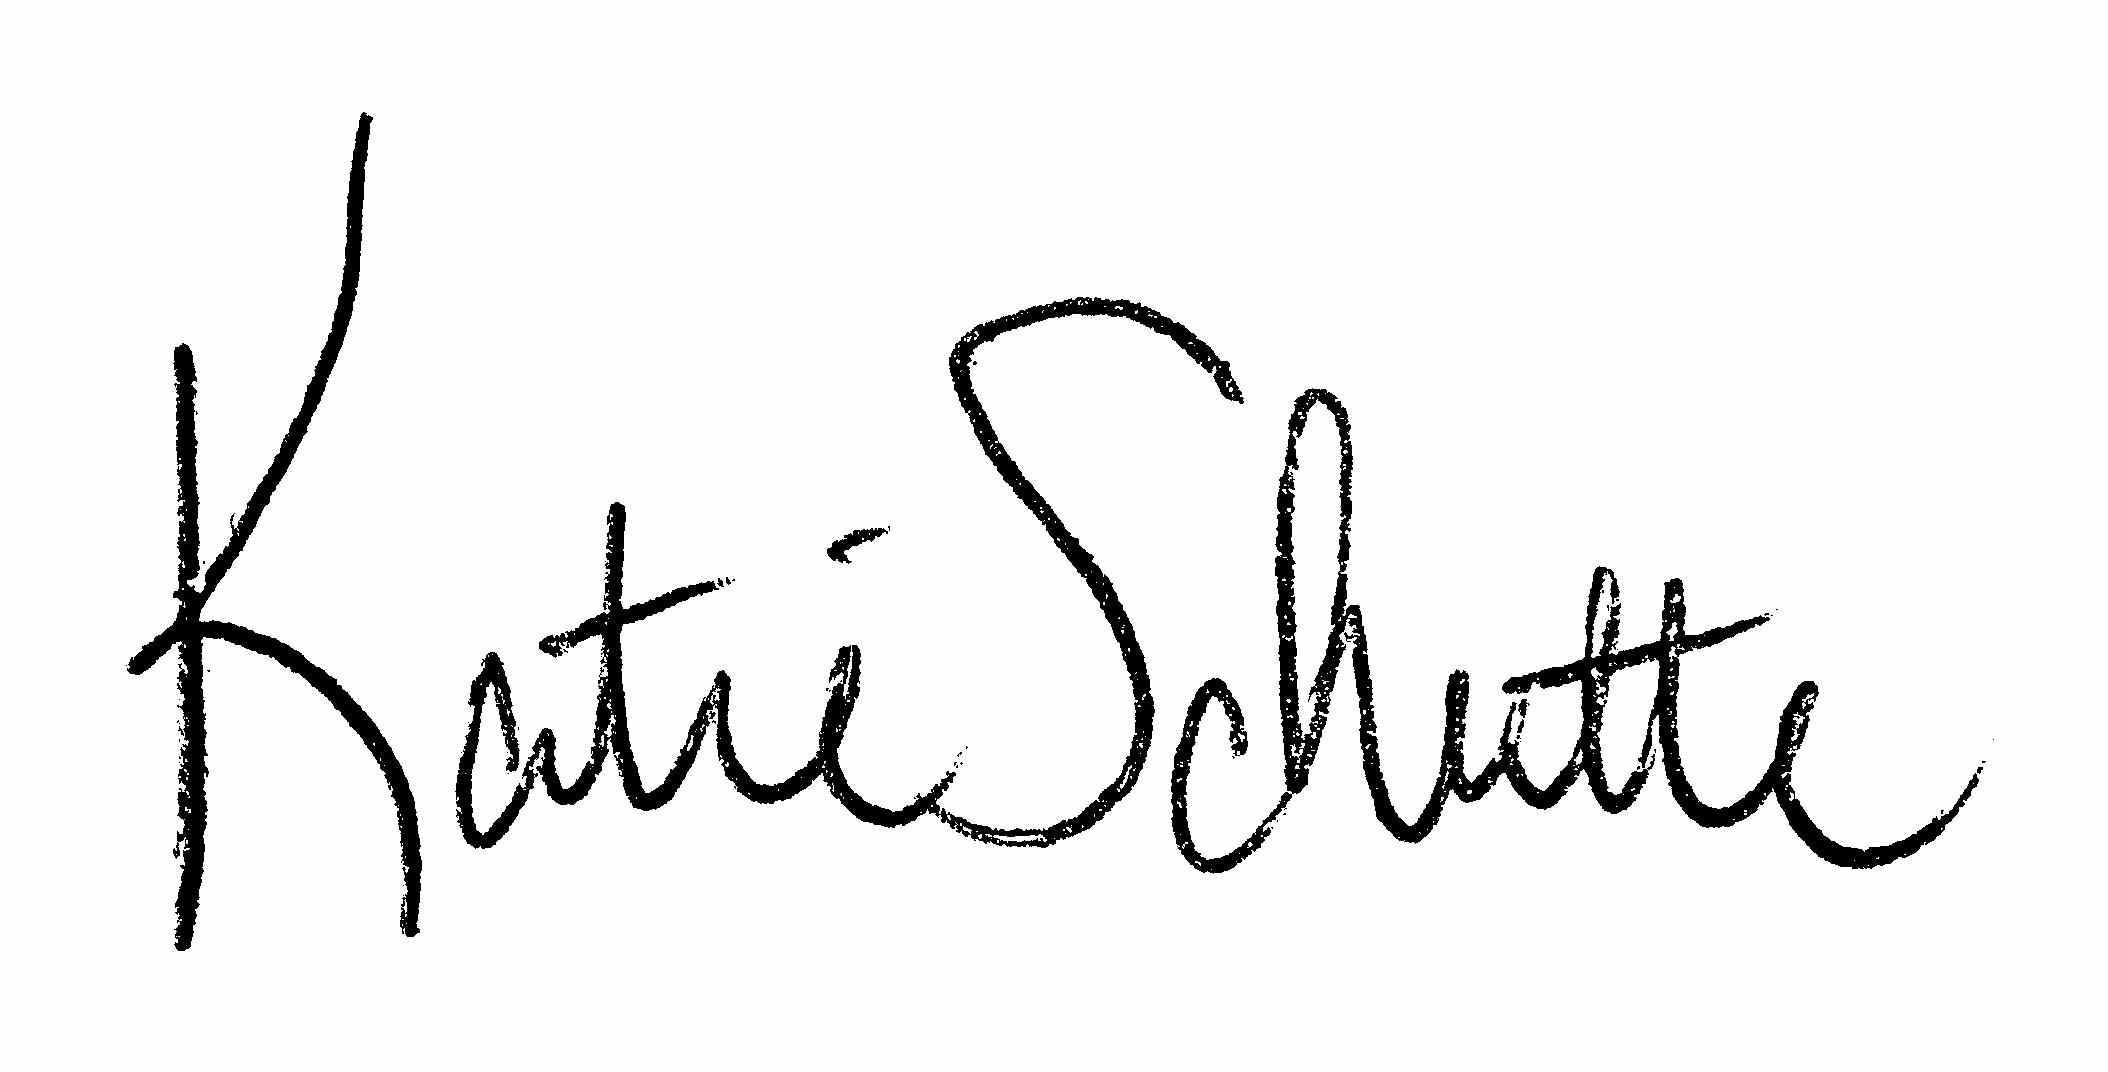 Katie Schutte's Signature